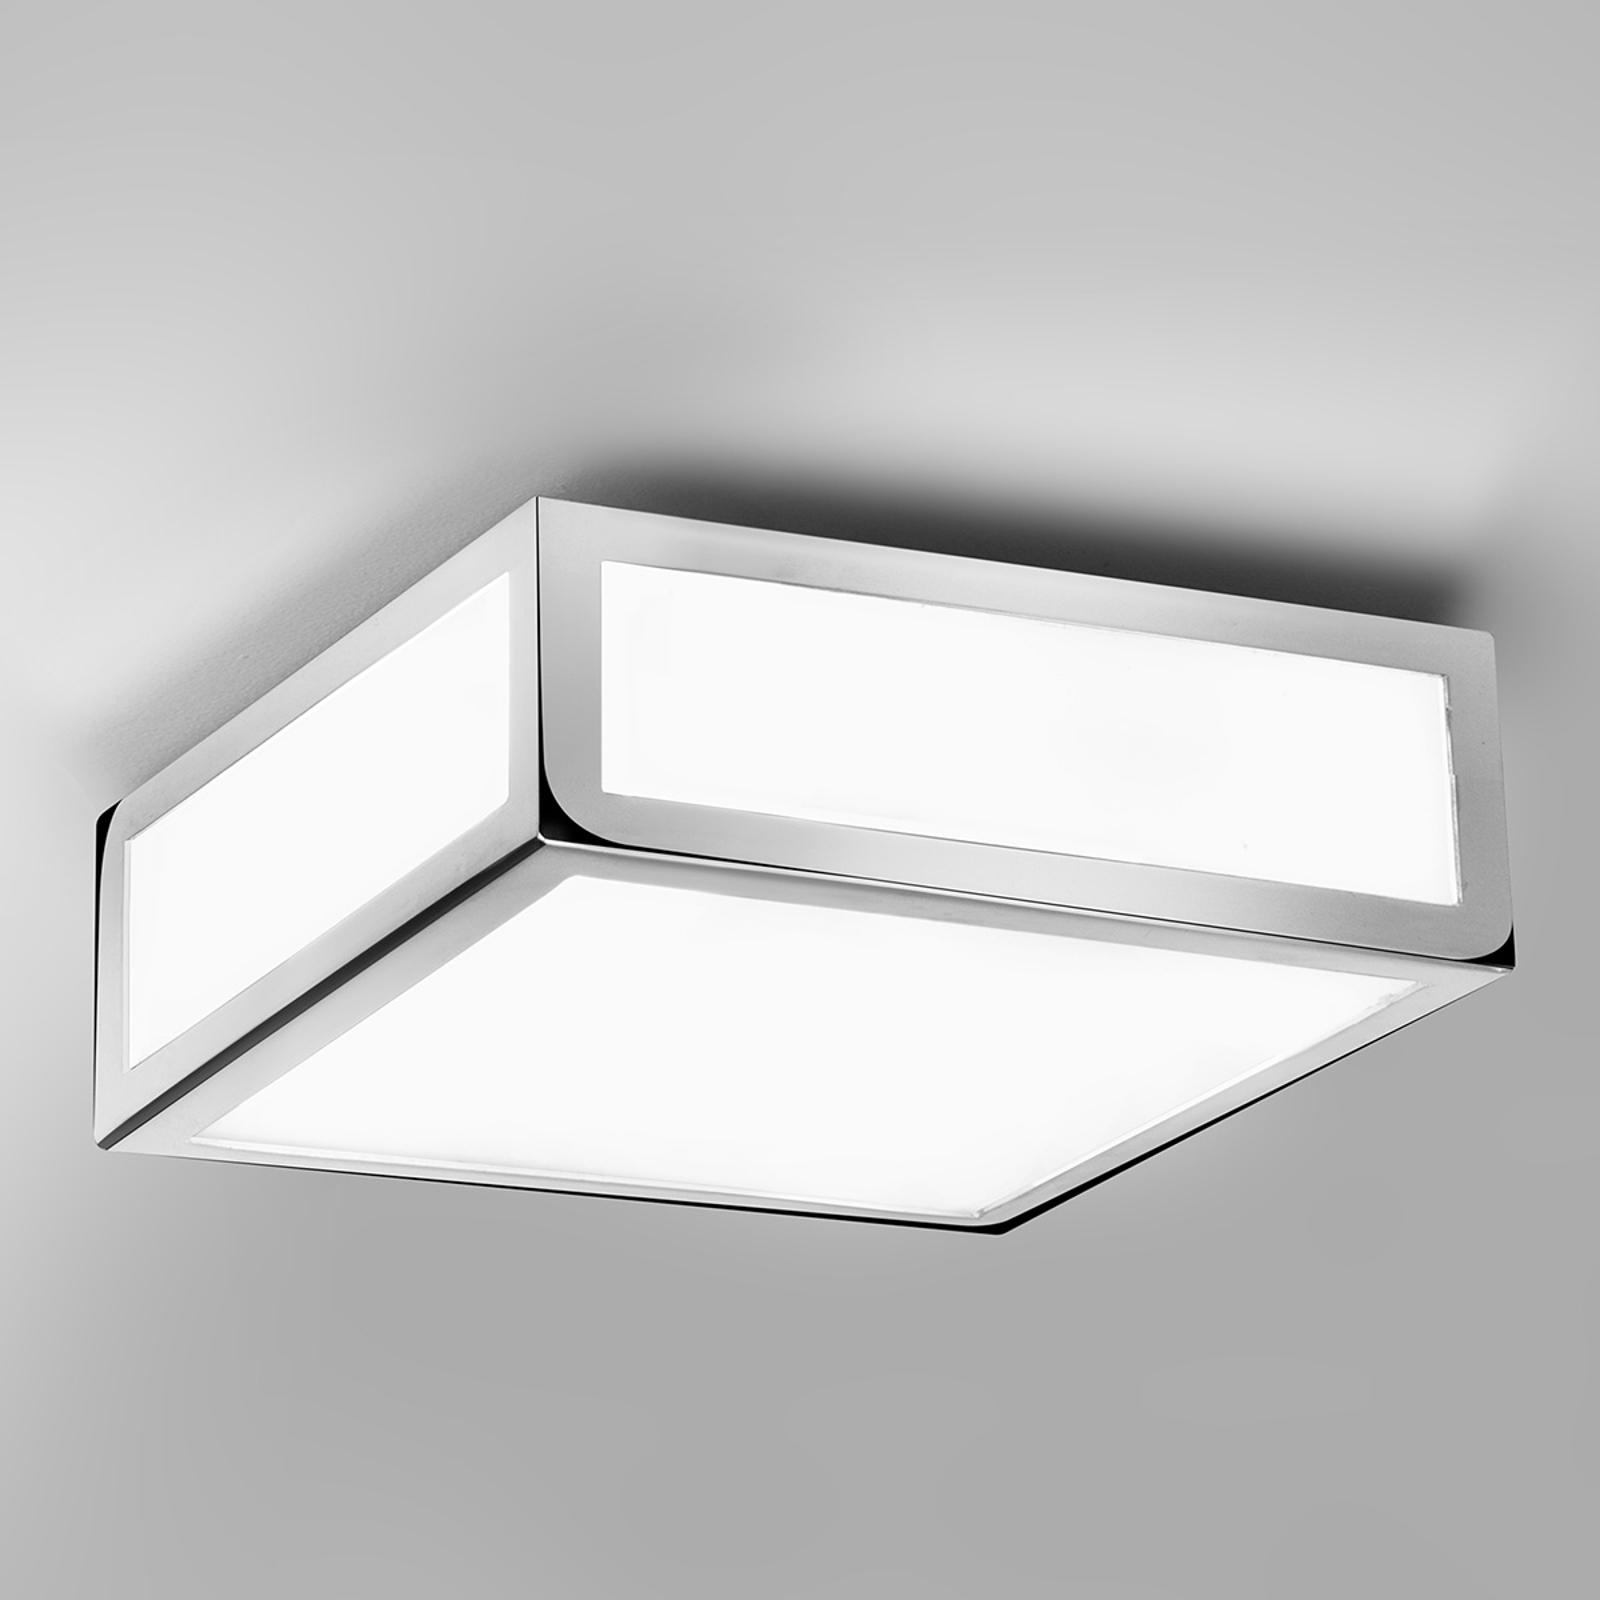 Kúpeľňové svietidlo Astro Mashiko, 20x20, chróm_1020302_1